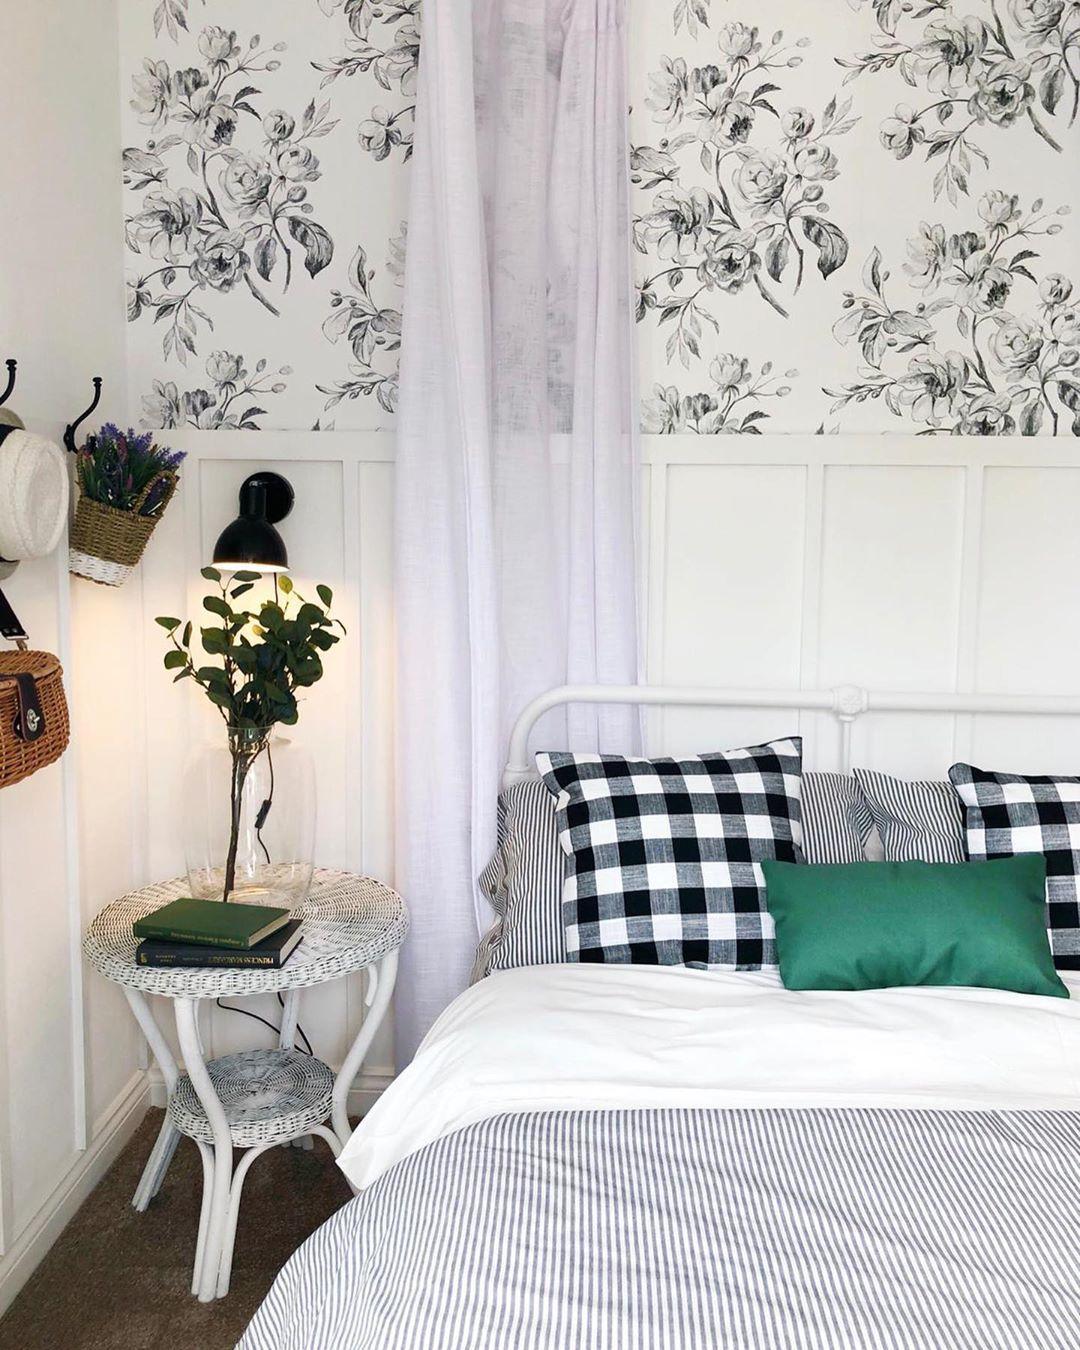 Nicki Bamford Bowes On Instagram Episode 5 Of Interiors Design Masters Bbc2 Saw Myself And Ju Tran Interior Design Masters Interior Design Bedroom Interior